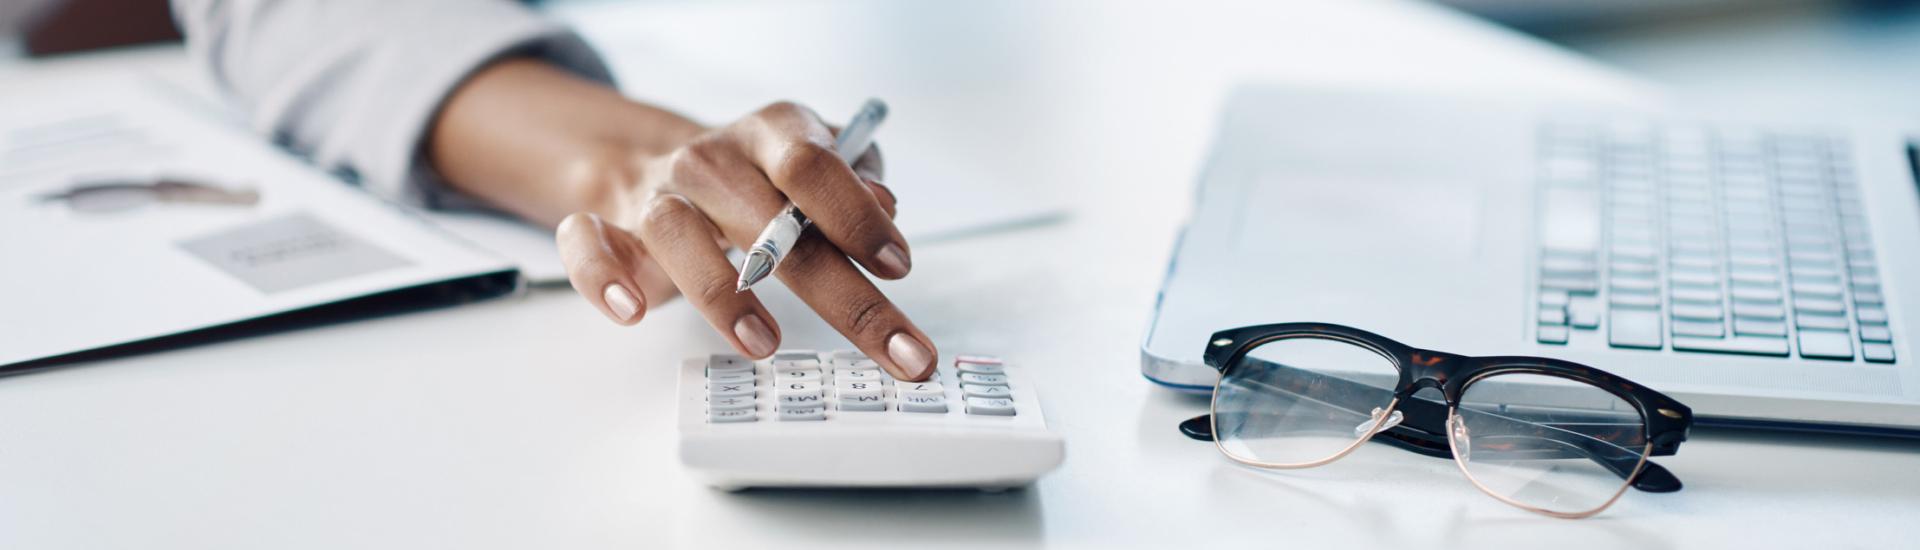 Businesswoman using a calculator at her desk